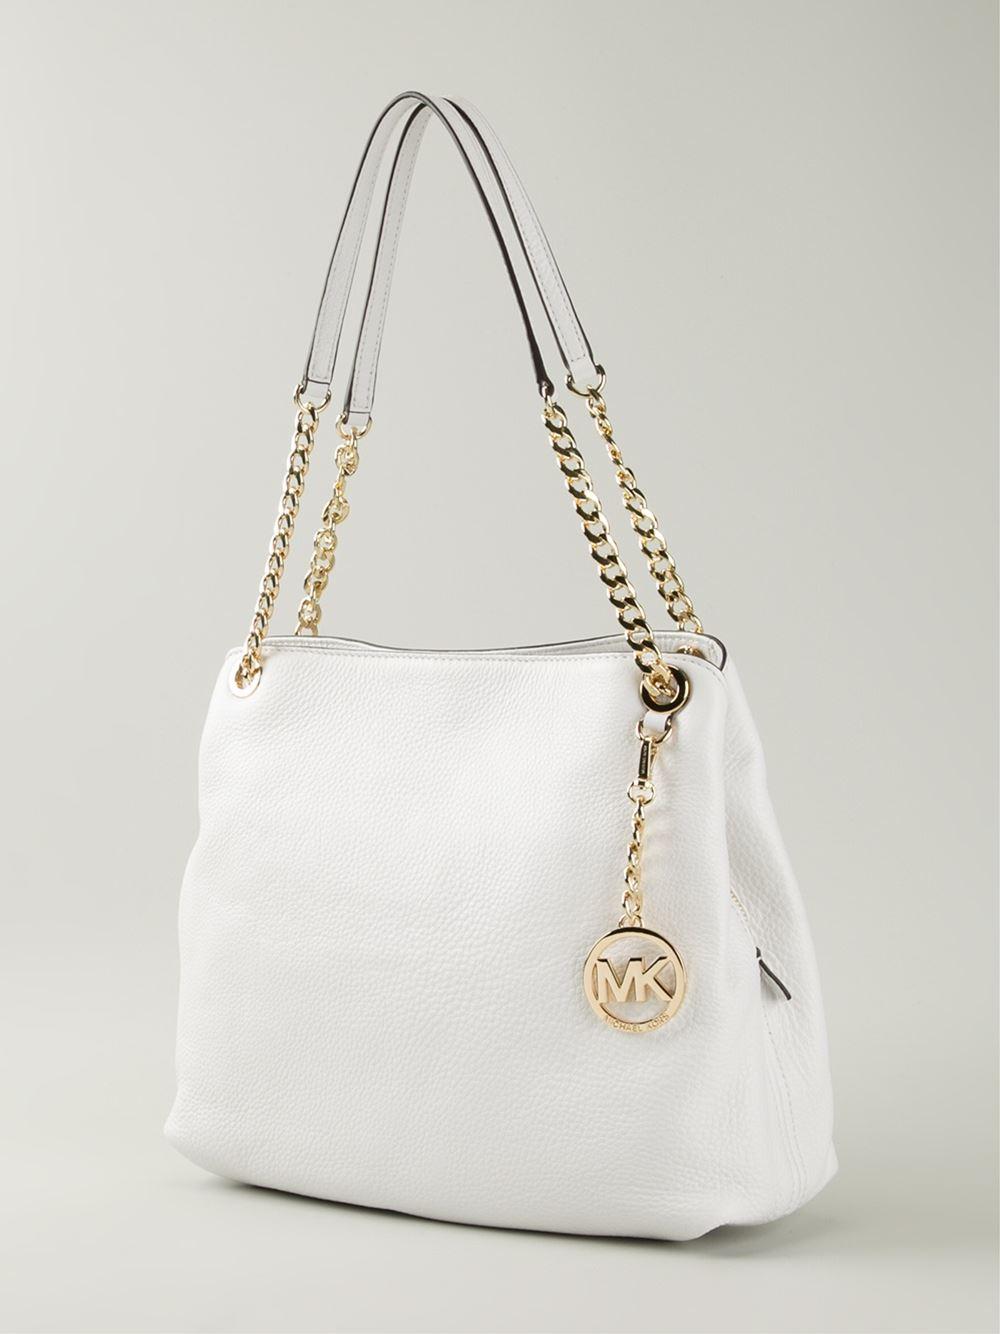 Lyst - MICHAEL Michael Kors Jet Set Chain Shoulder Bag in White